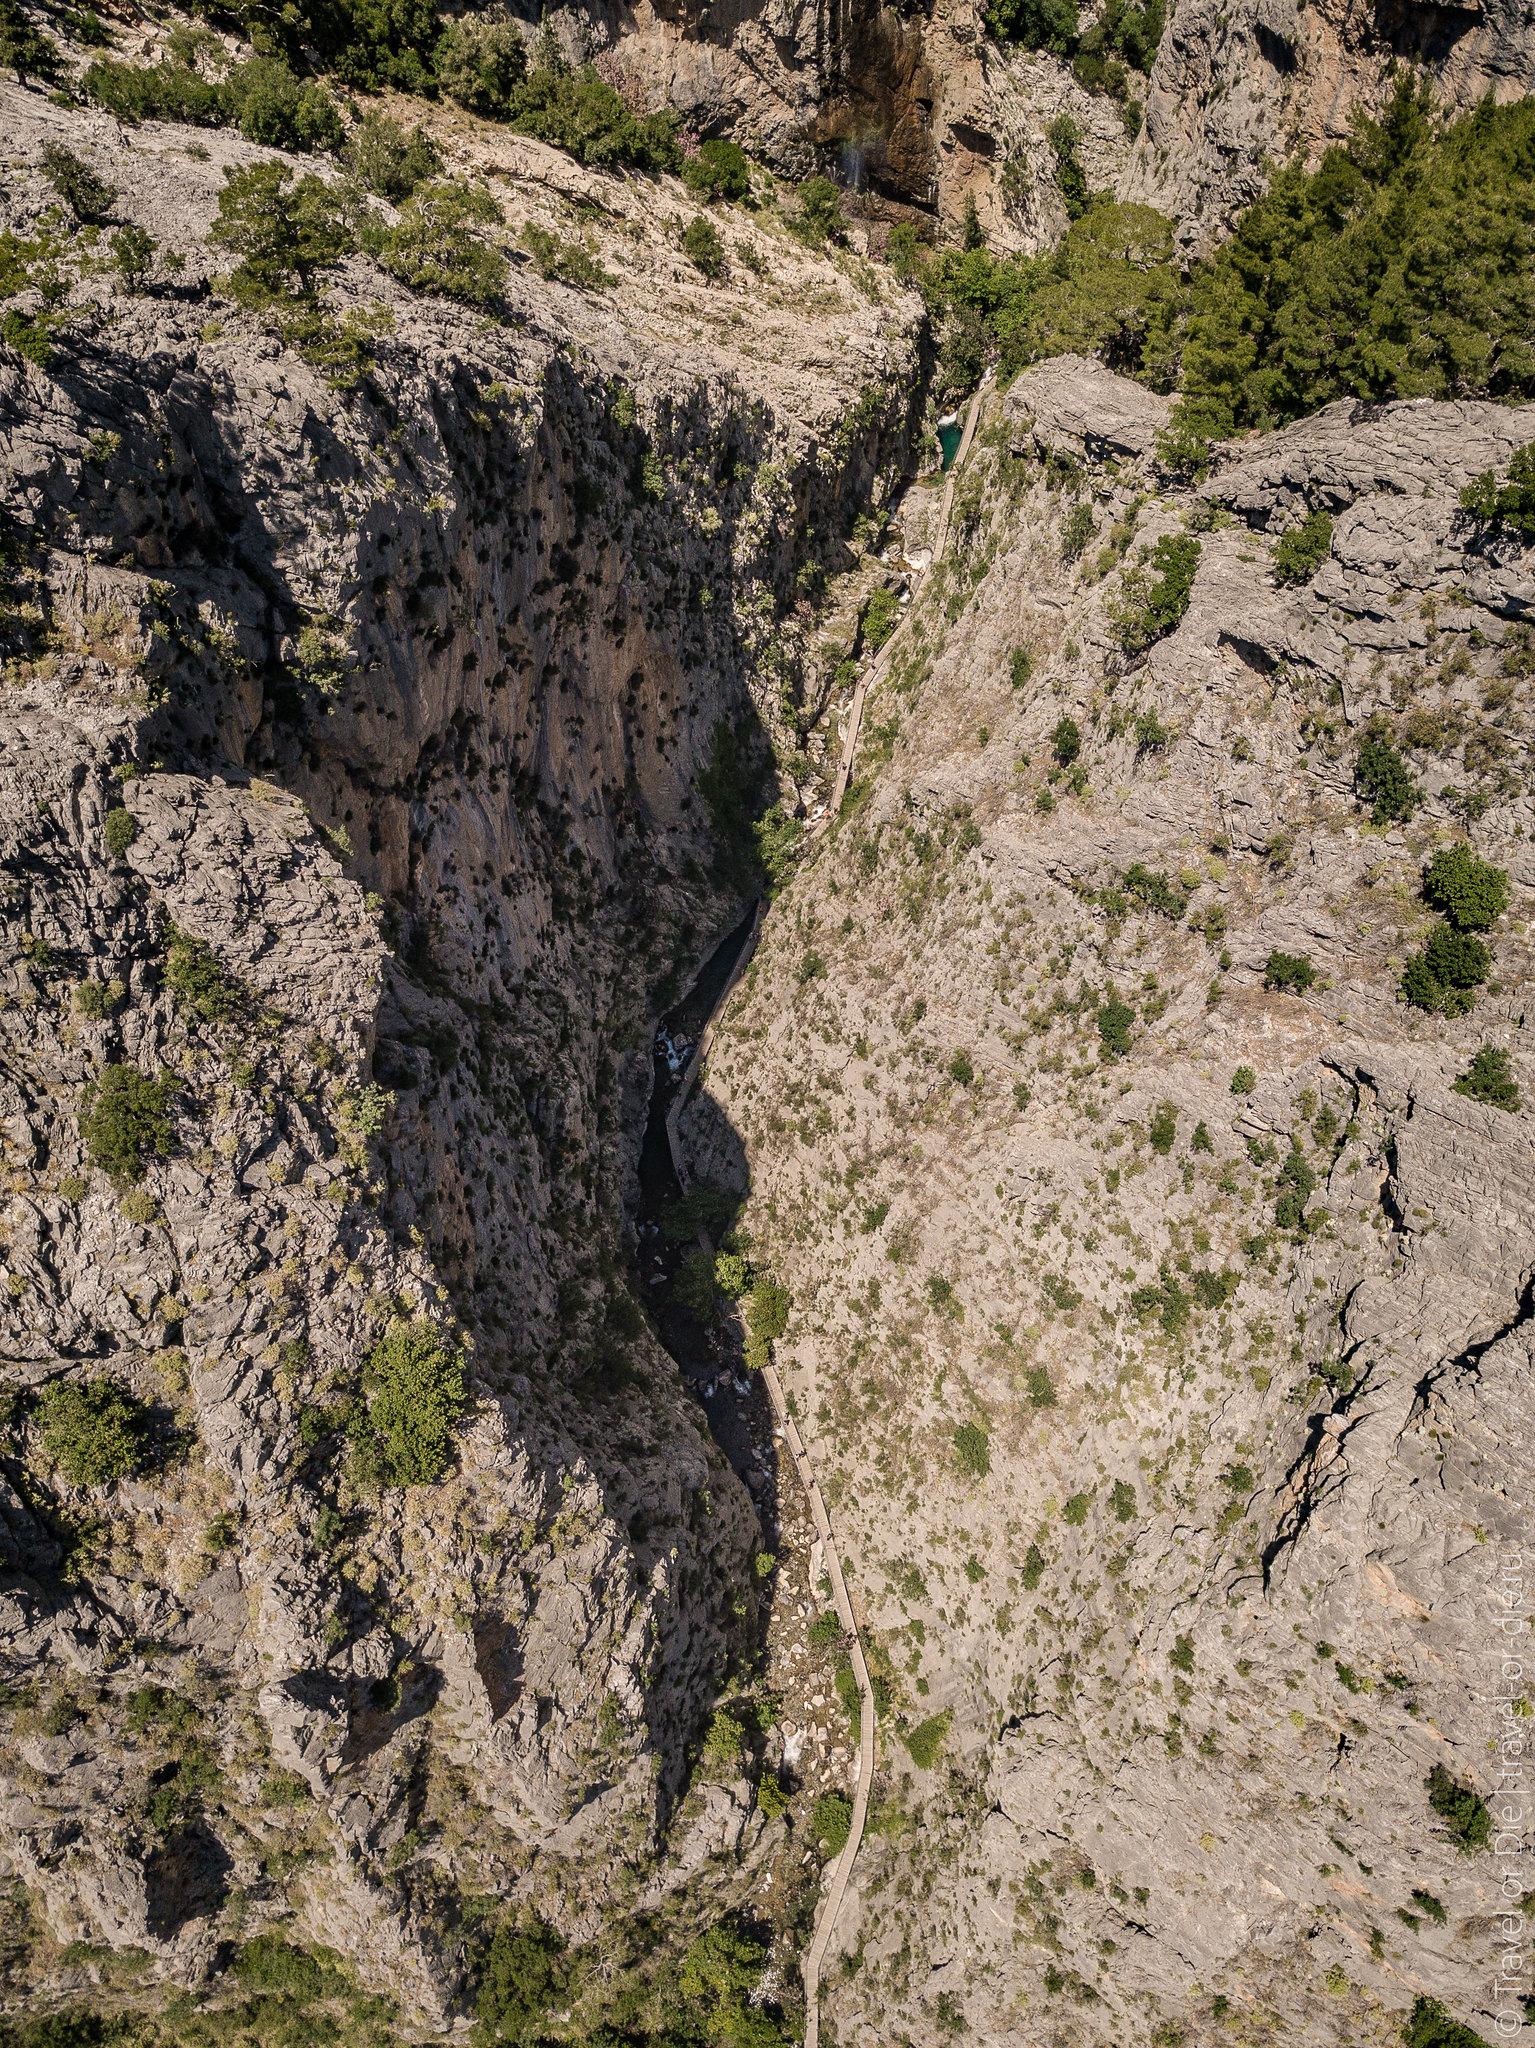 Sapadere-Canyon-Tour-экскурсия-в-каньон-сападере-mavic-0522